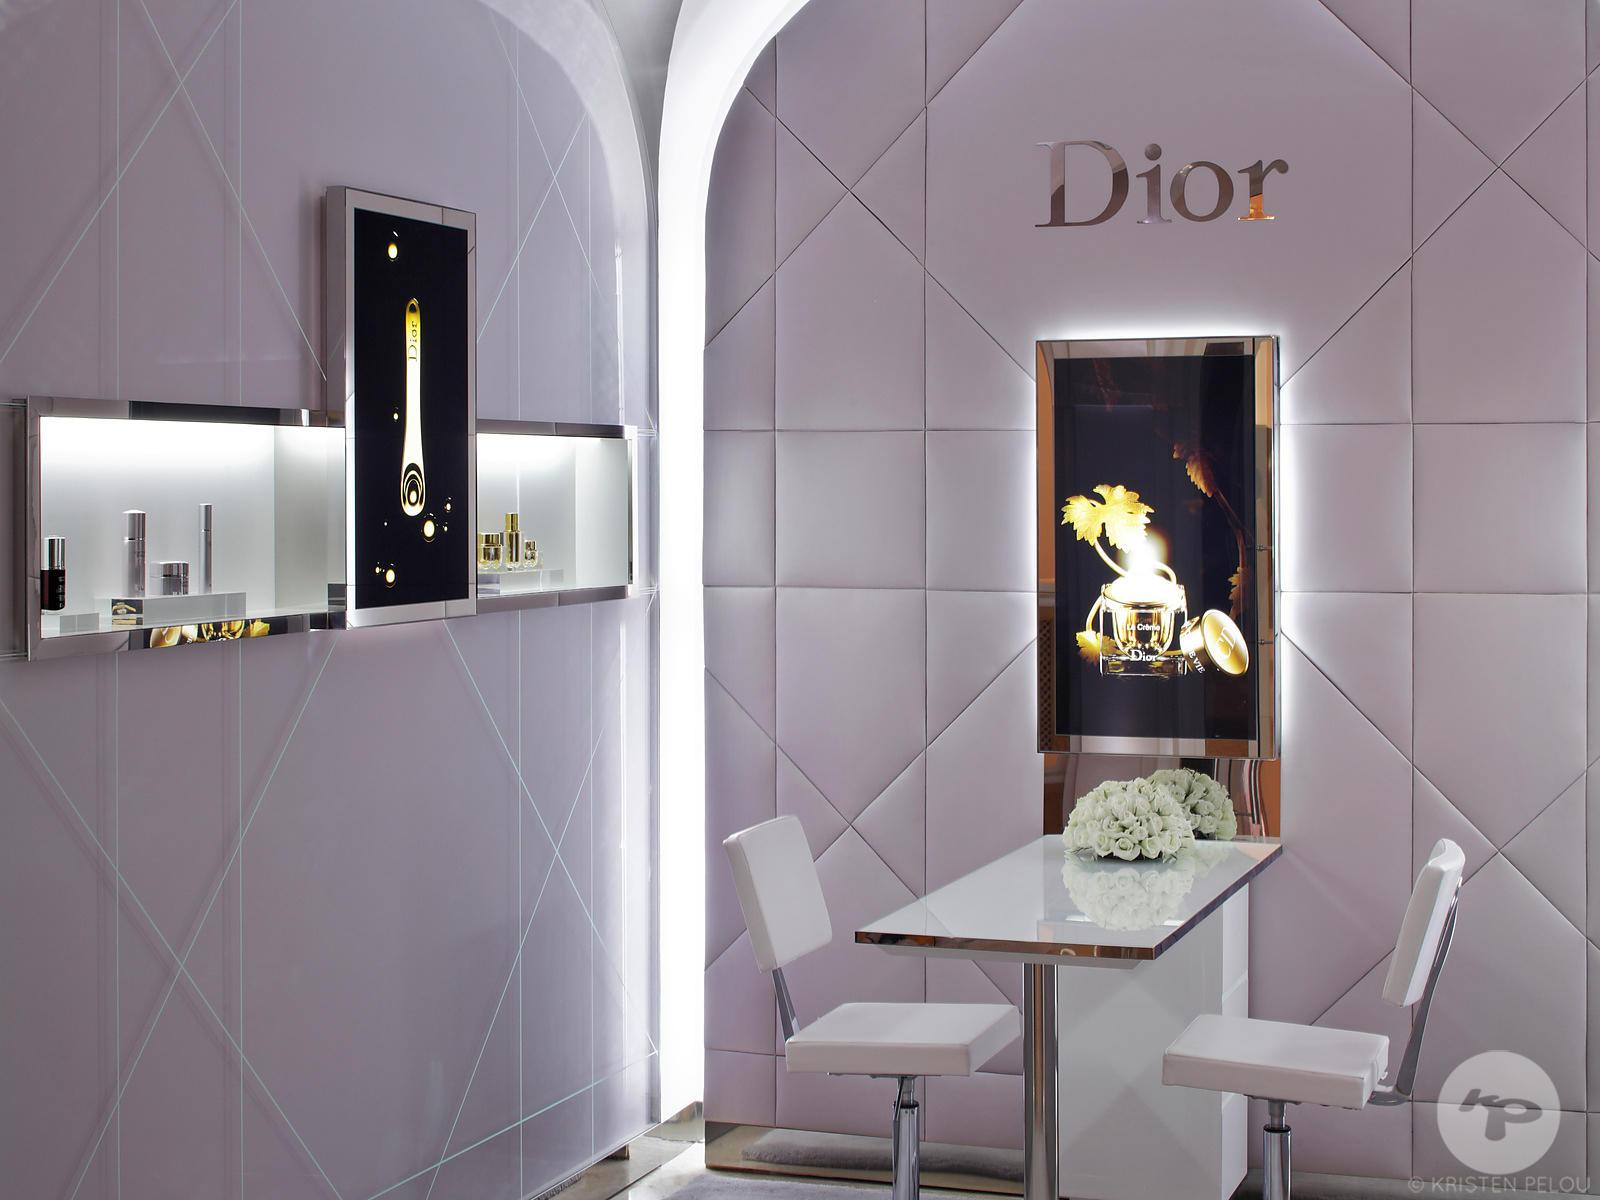 Architecture photographe paris retail interior more for Design hotel marrakech